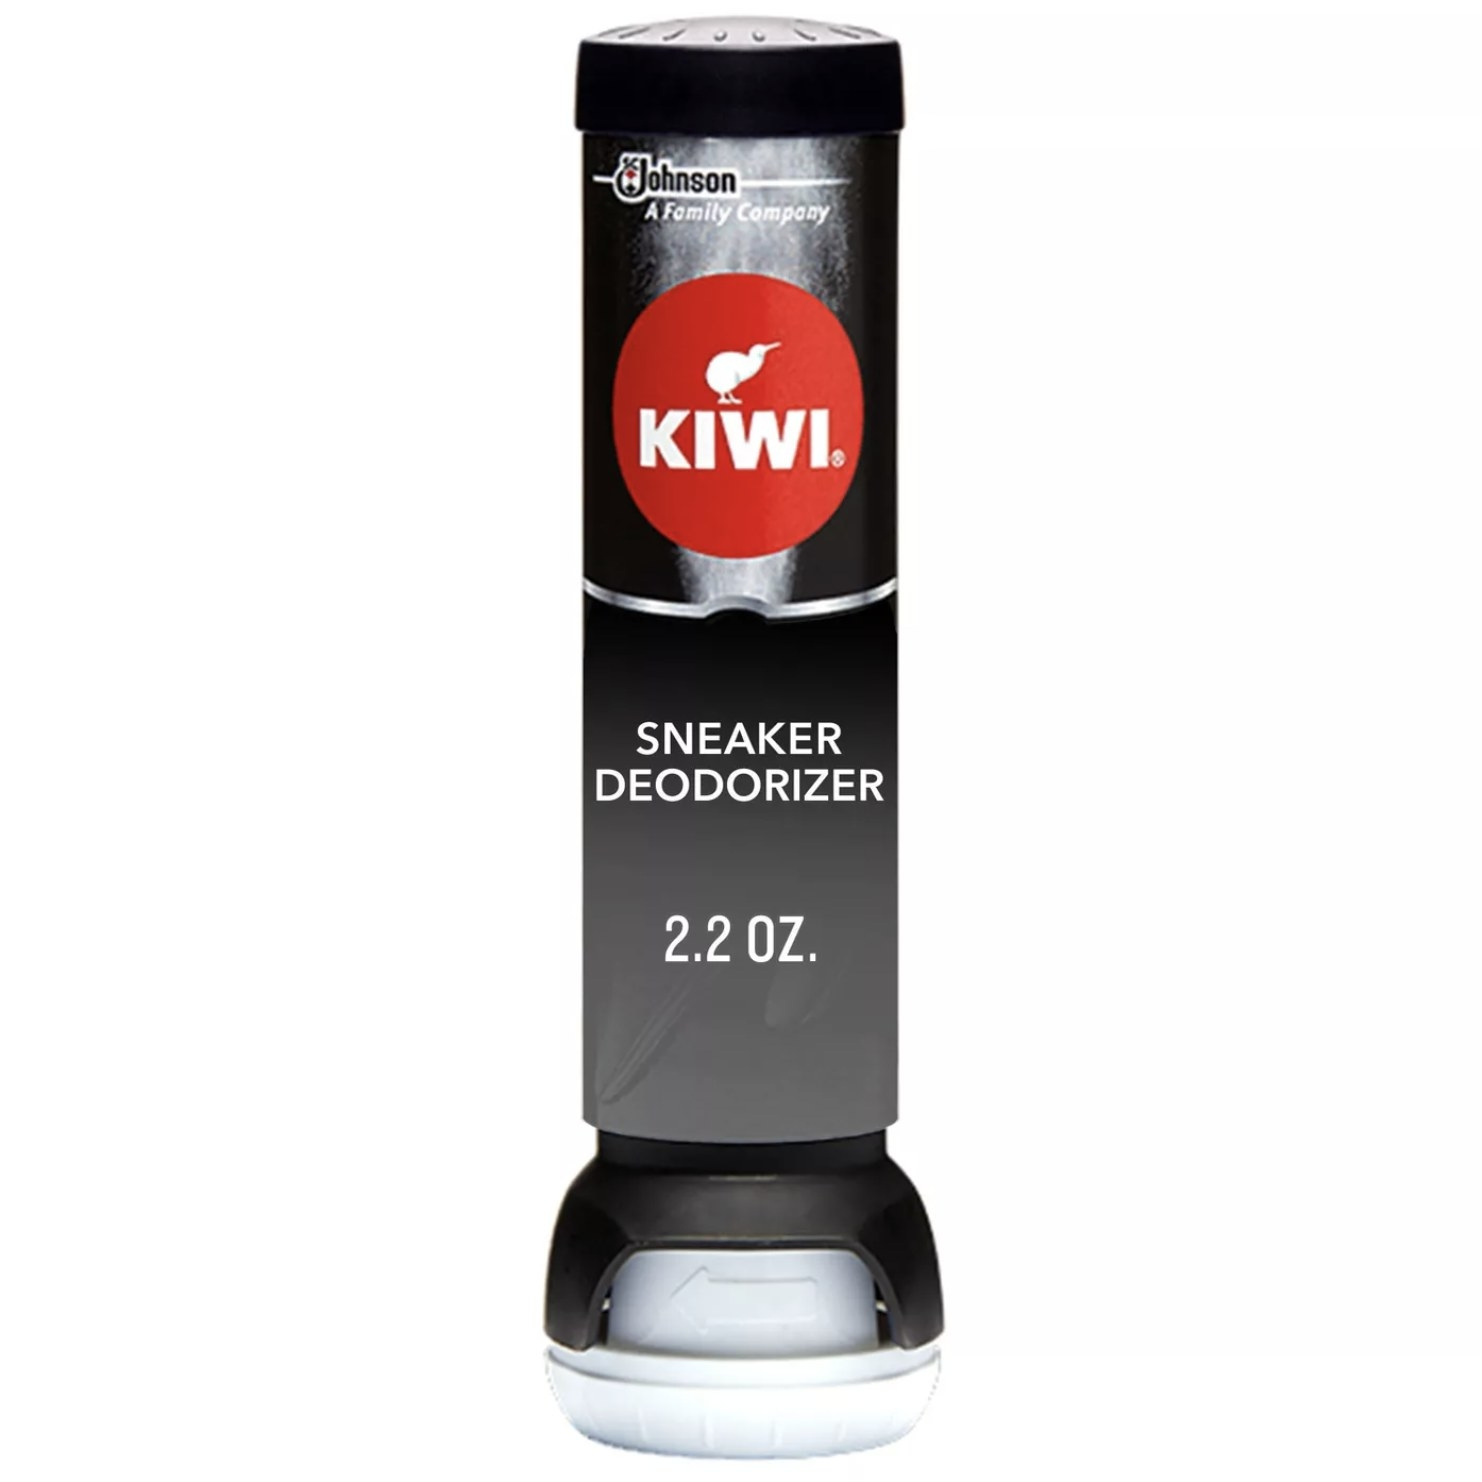 A tube of sneaker deodorizer